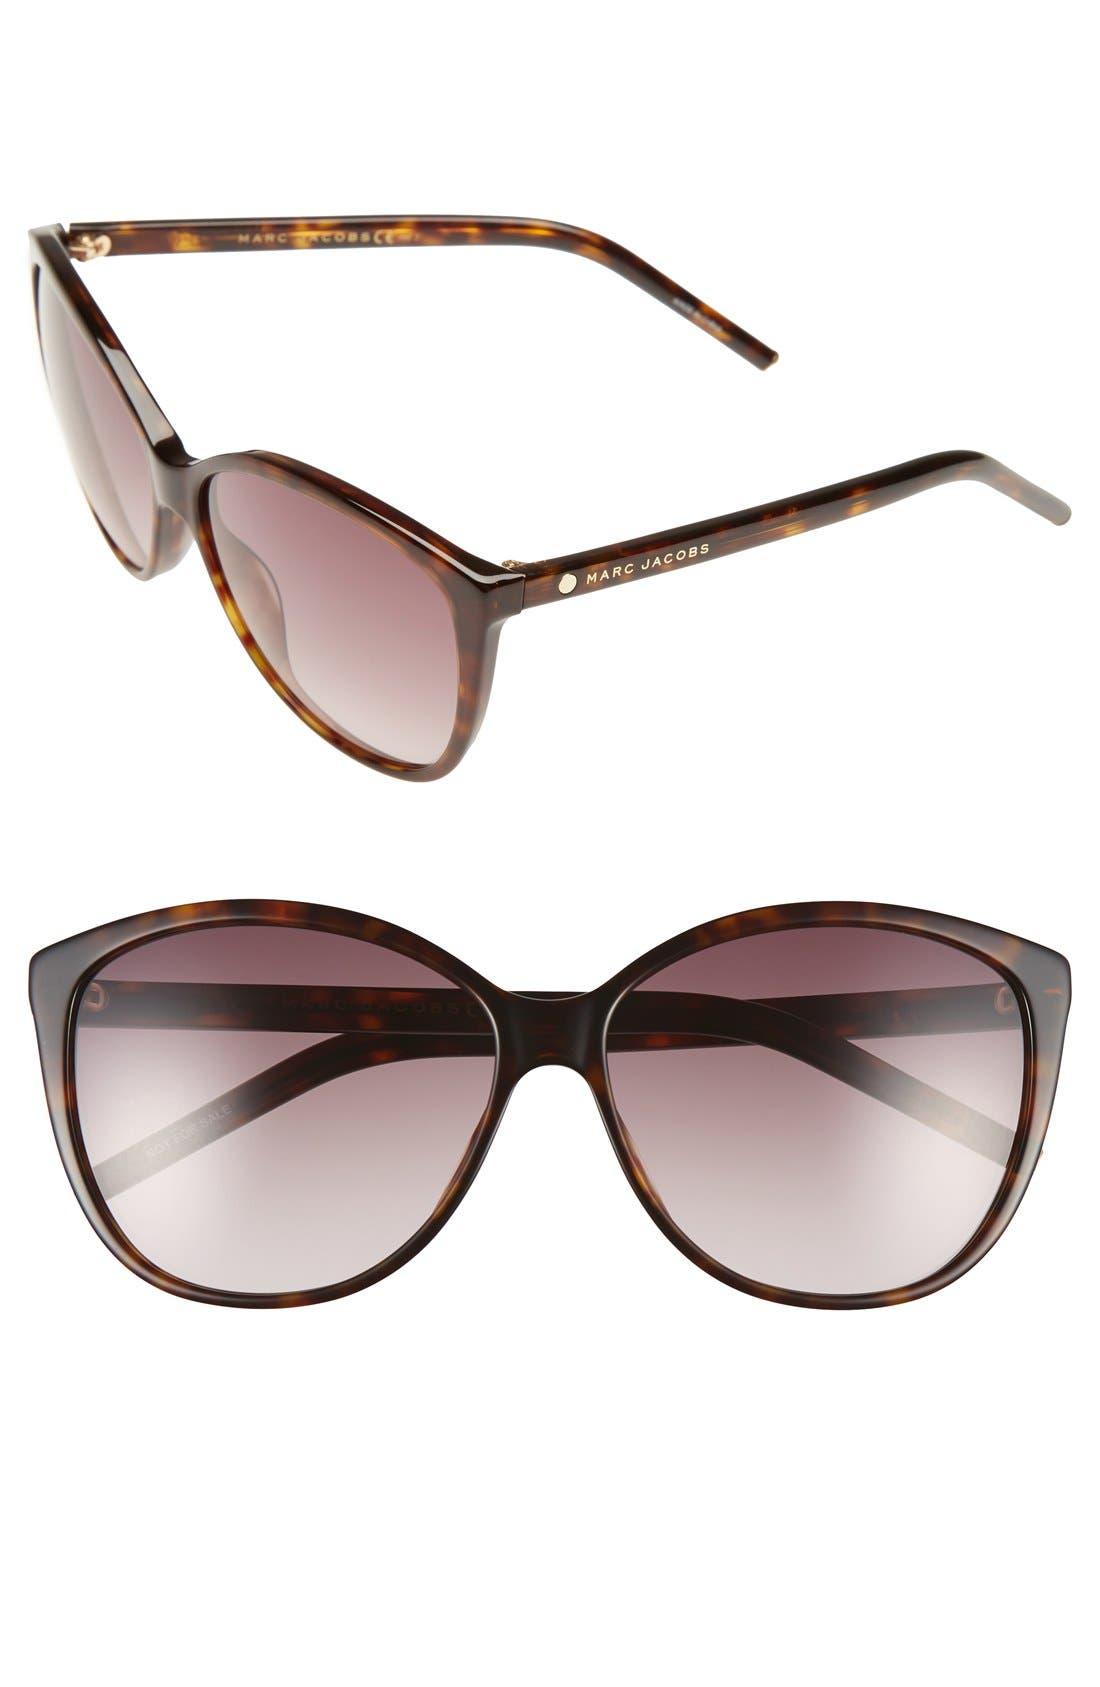 58mm Polarized Butterfly Sunglasses,                             Main thumbnail 1, color,                             DARK HAVANA